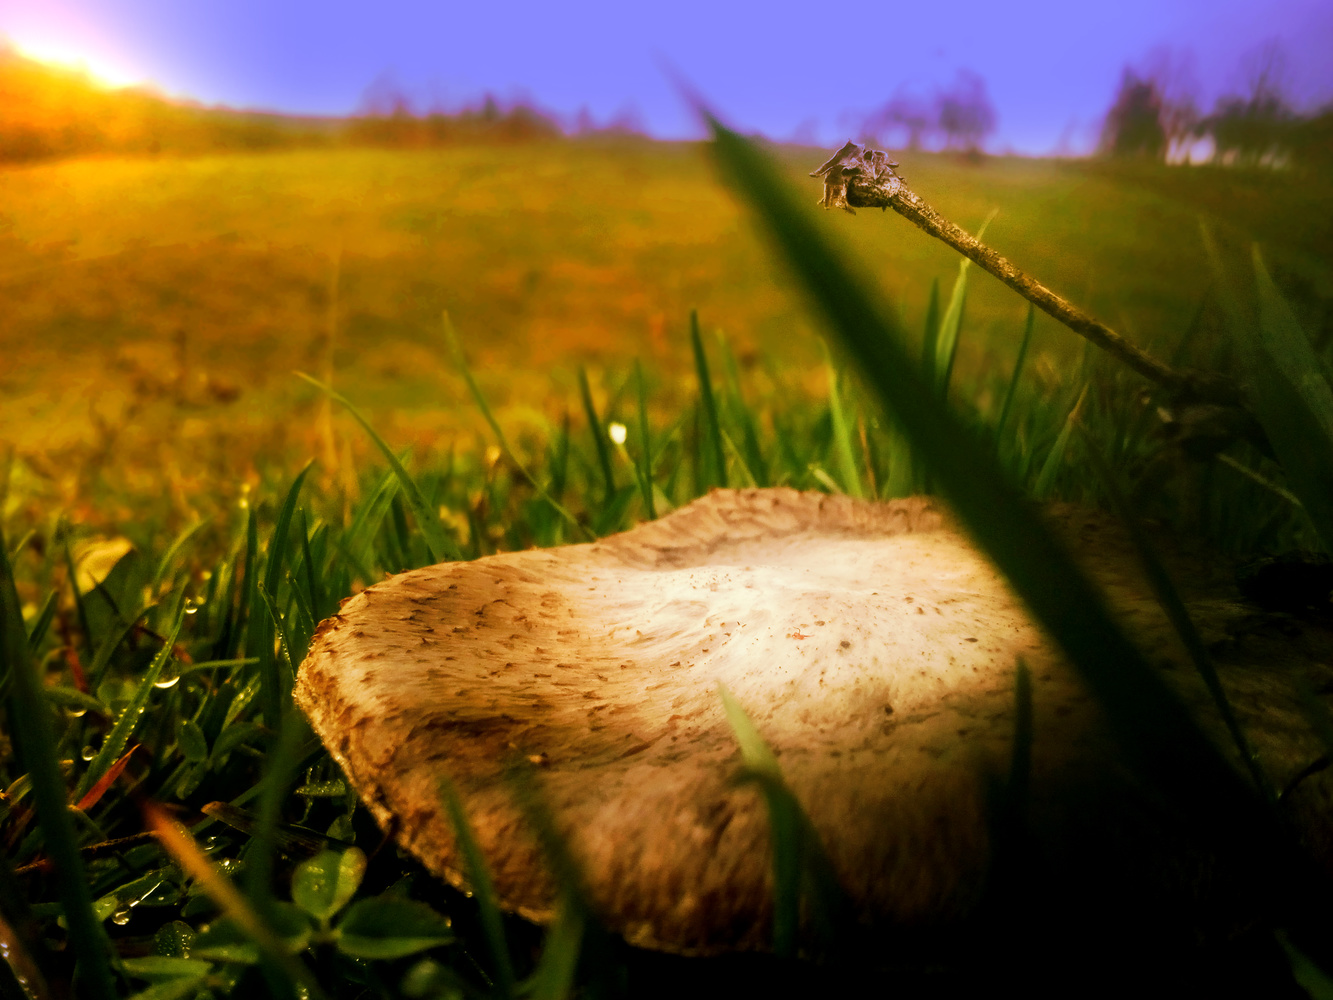 Mushroom is sunset by Dijana Kr